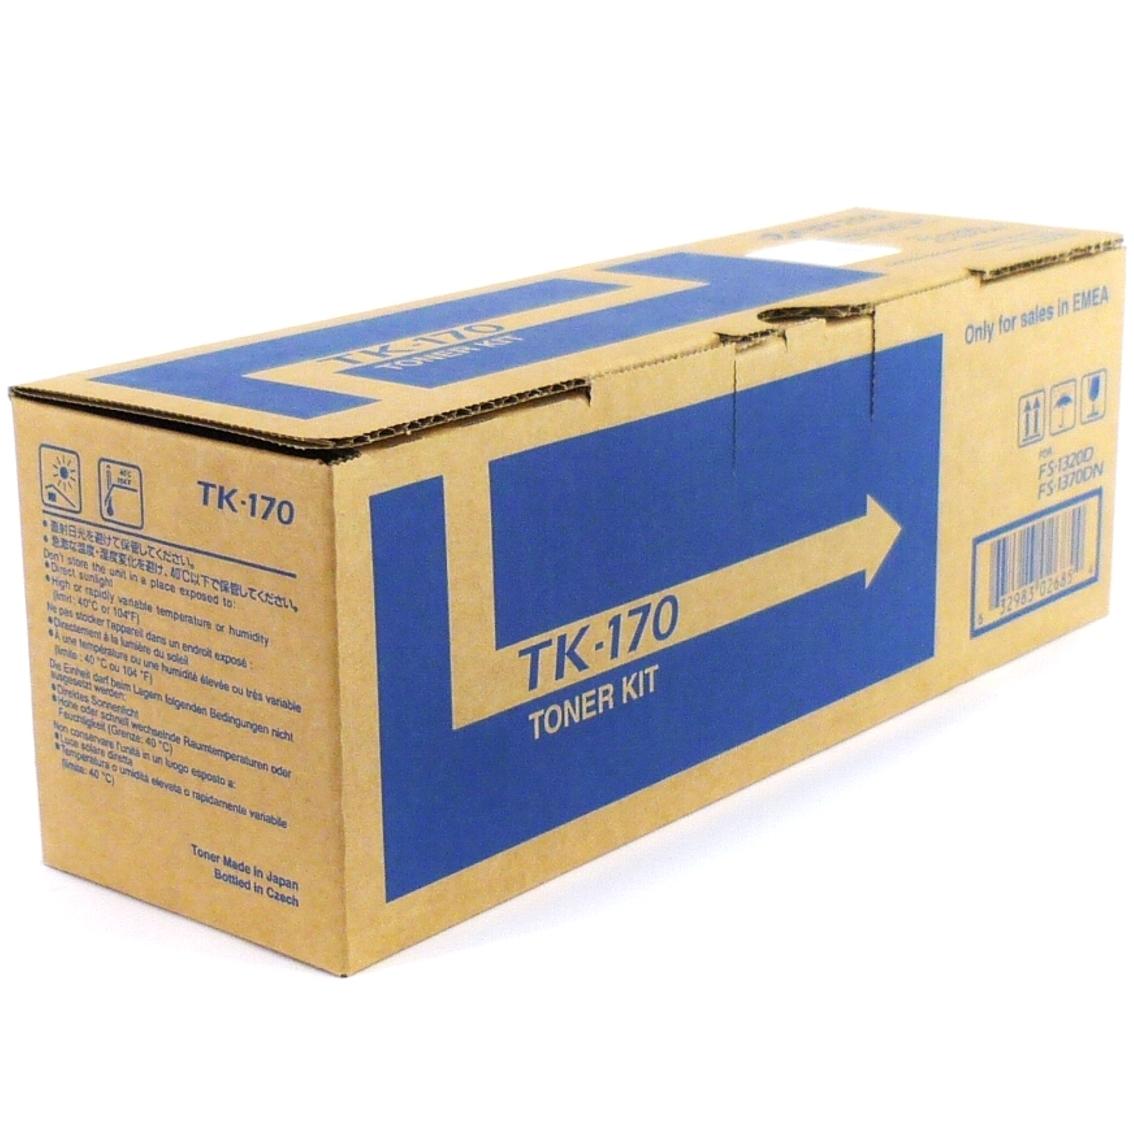 original kyocera tk 170 tonerkit f r fs 1320d fs 1370dn mit rechnung ebay. Black Bedroom Furniture Sets. Home Design Ideas